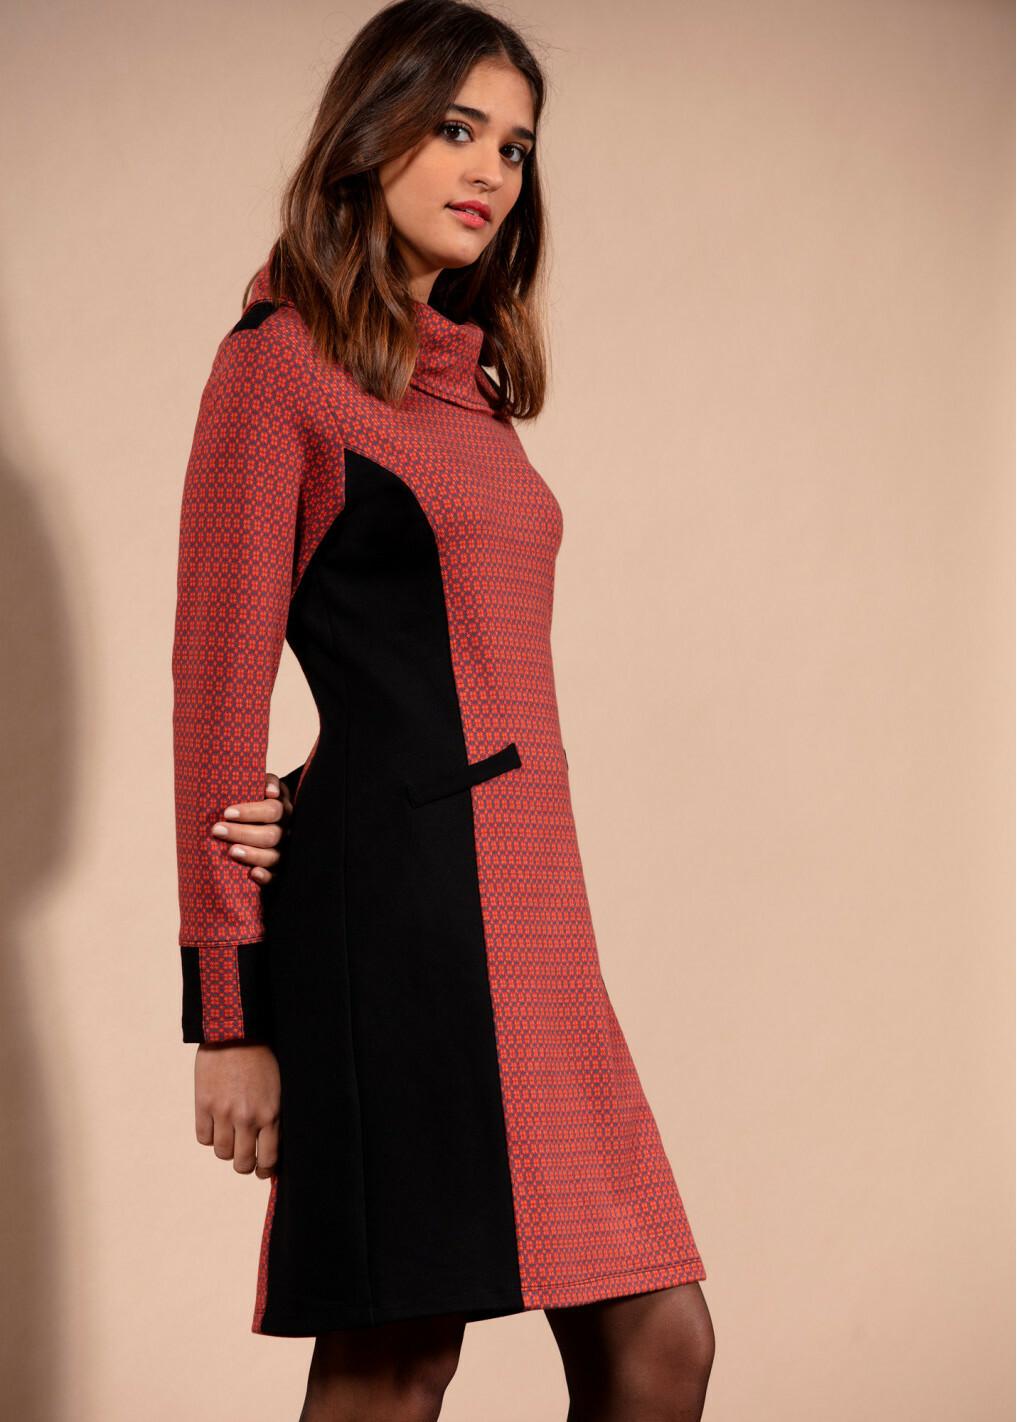 Maloka: Sedona Rock Jacquard Contrast Dress MK_FLOWER_N2